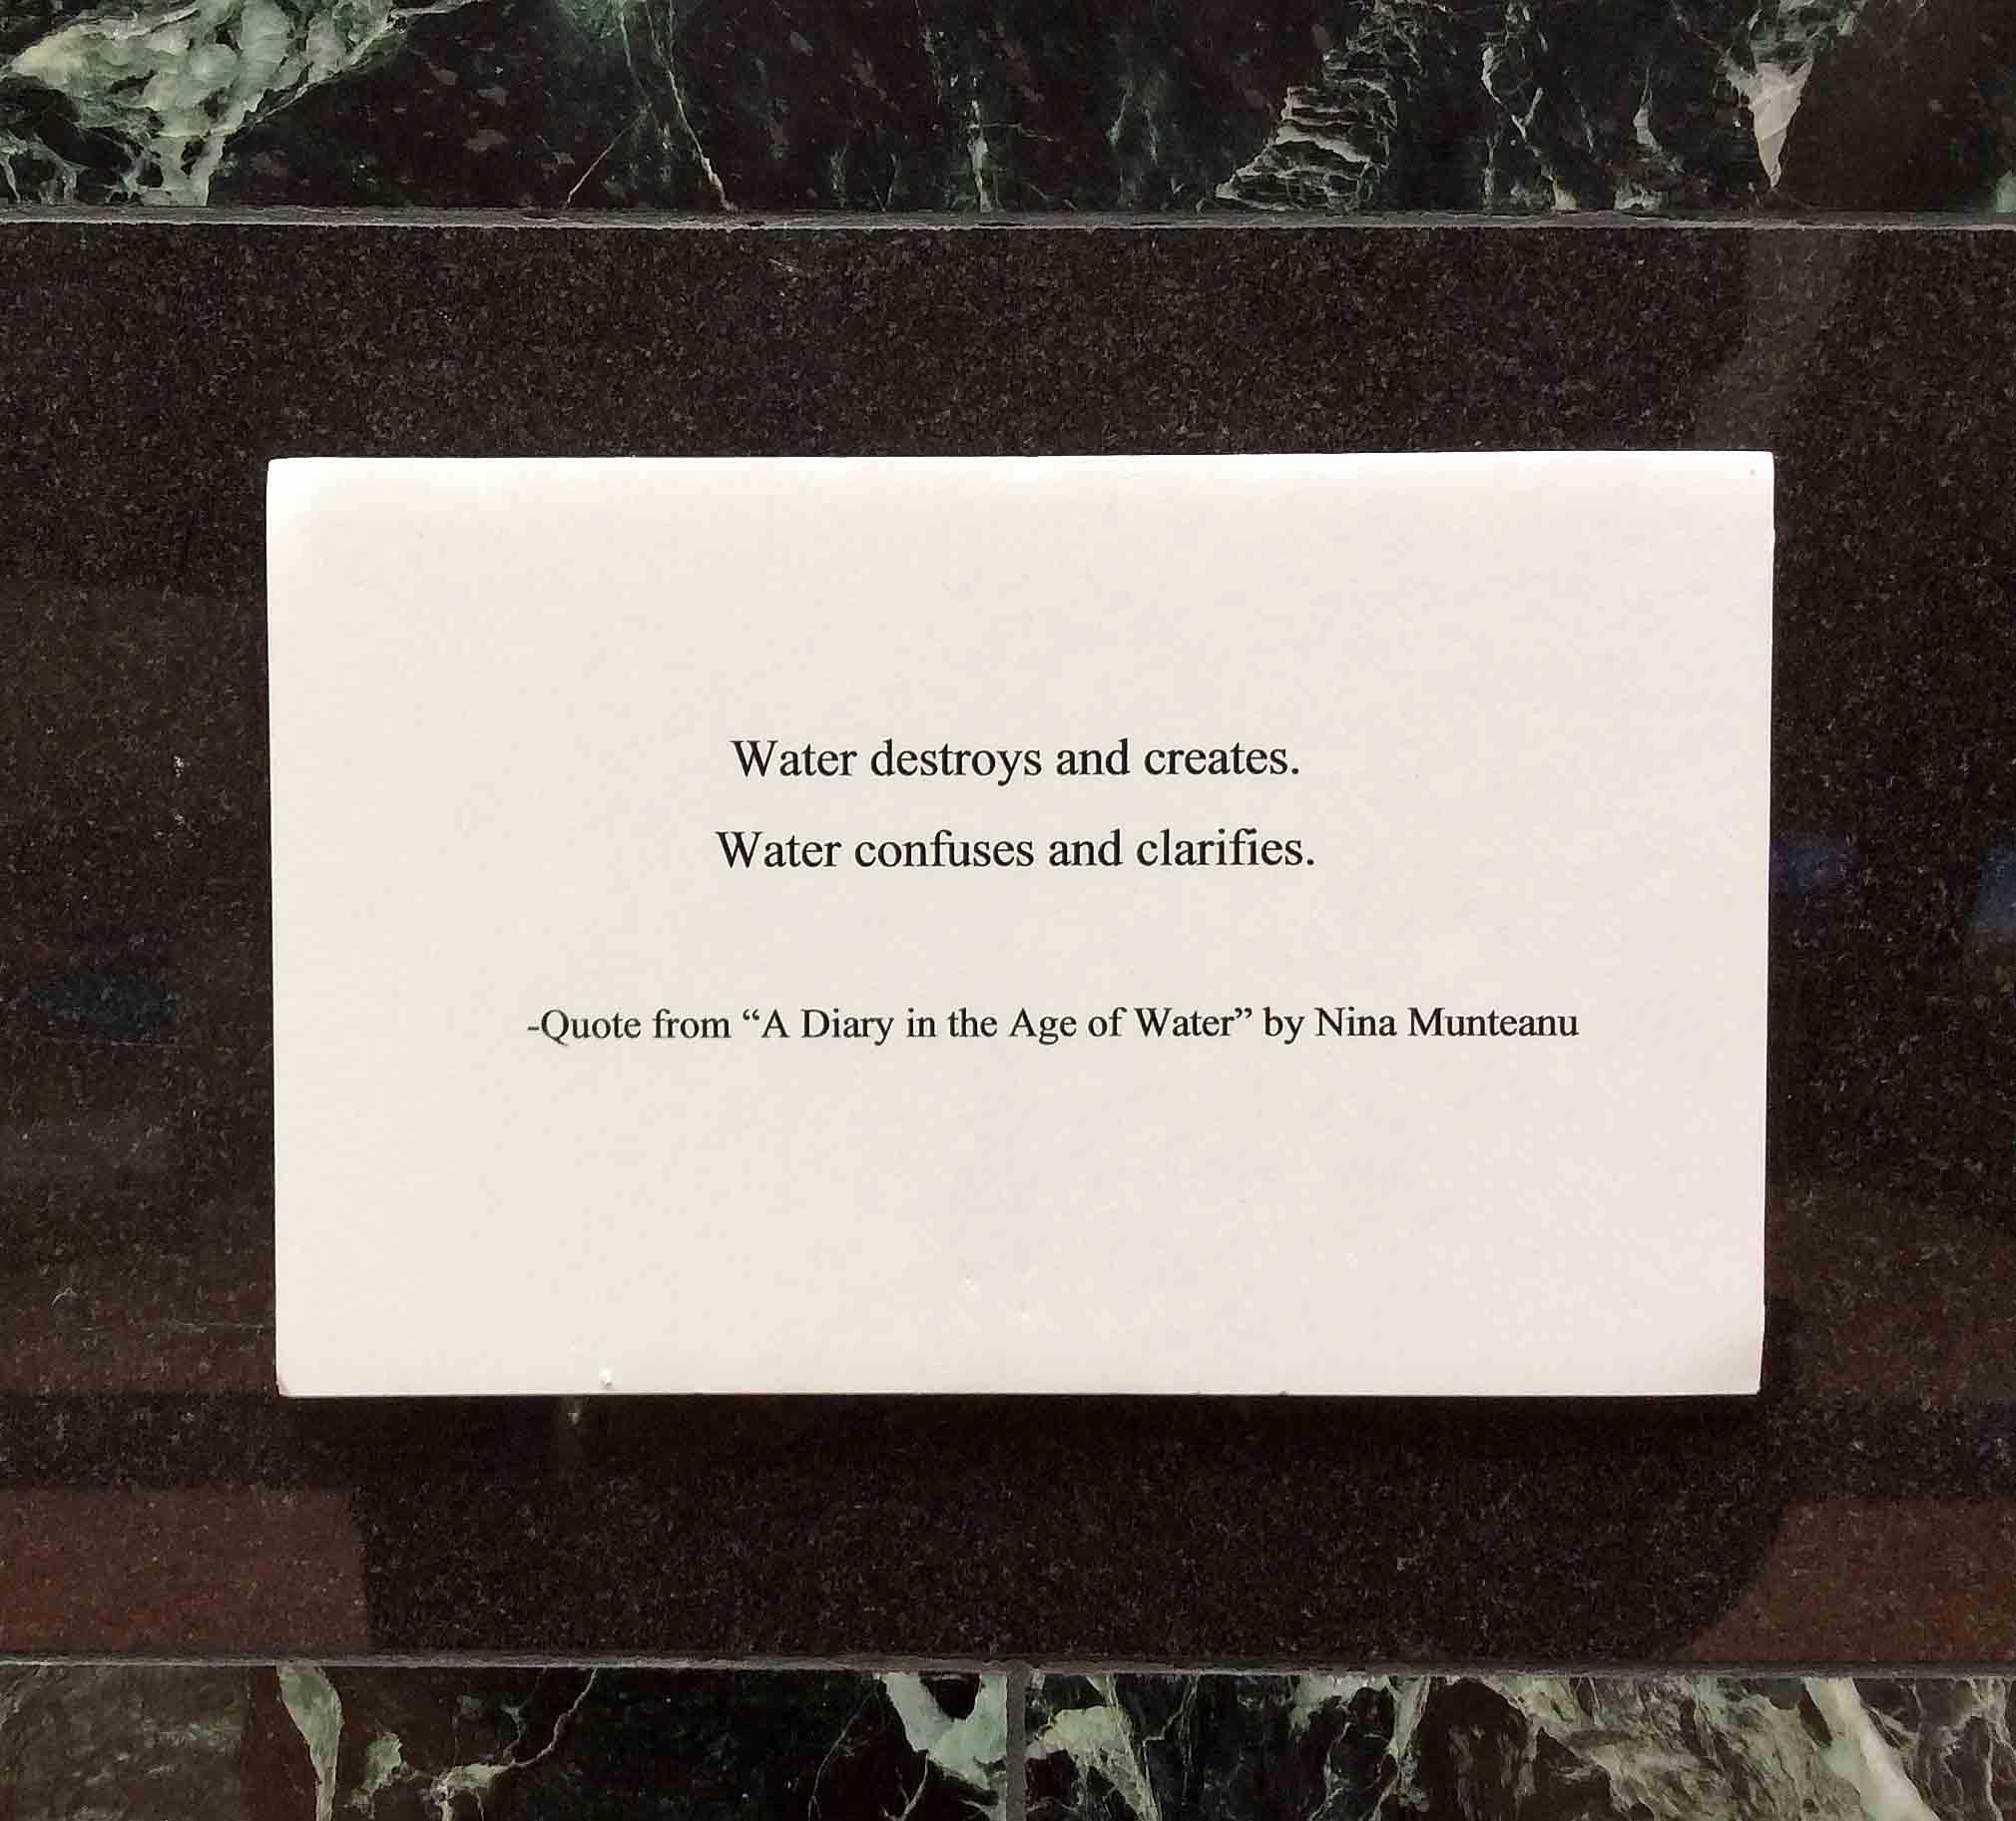 Water-destroys creates-Diary